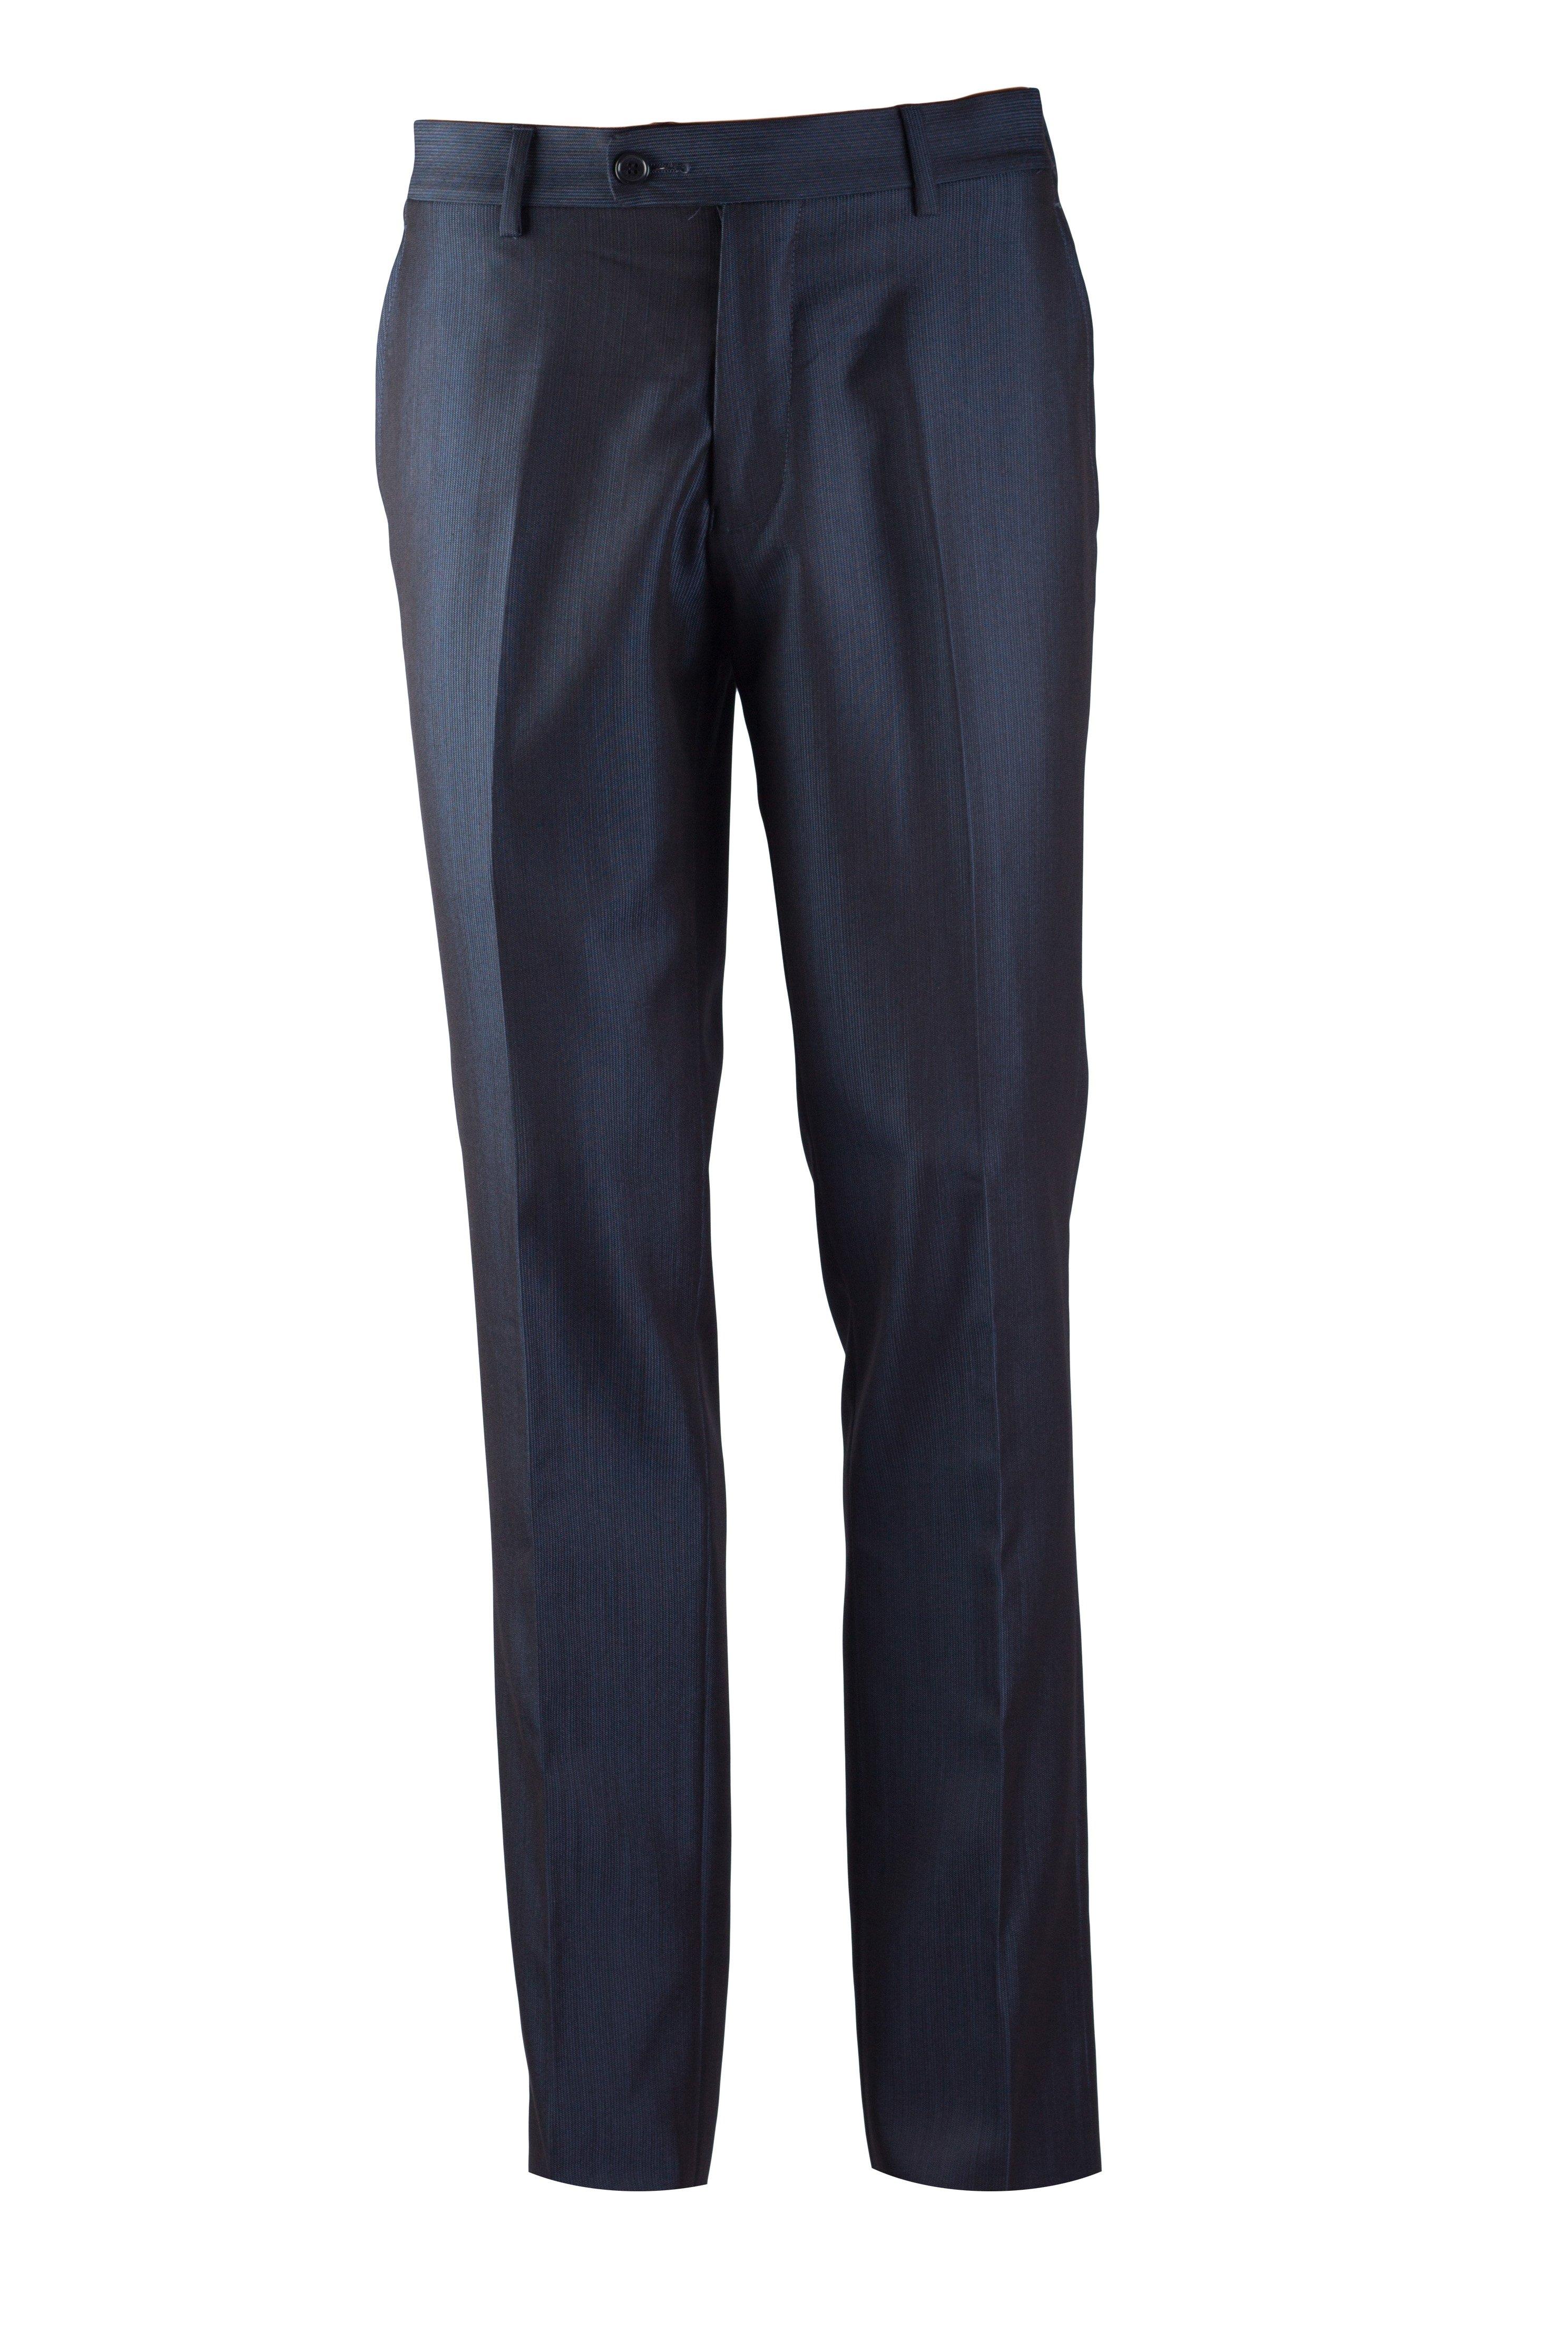 Pantaloni albastri cu dungi fine Grazie Filipeti